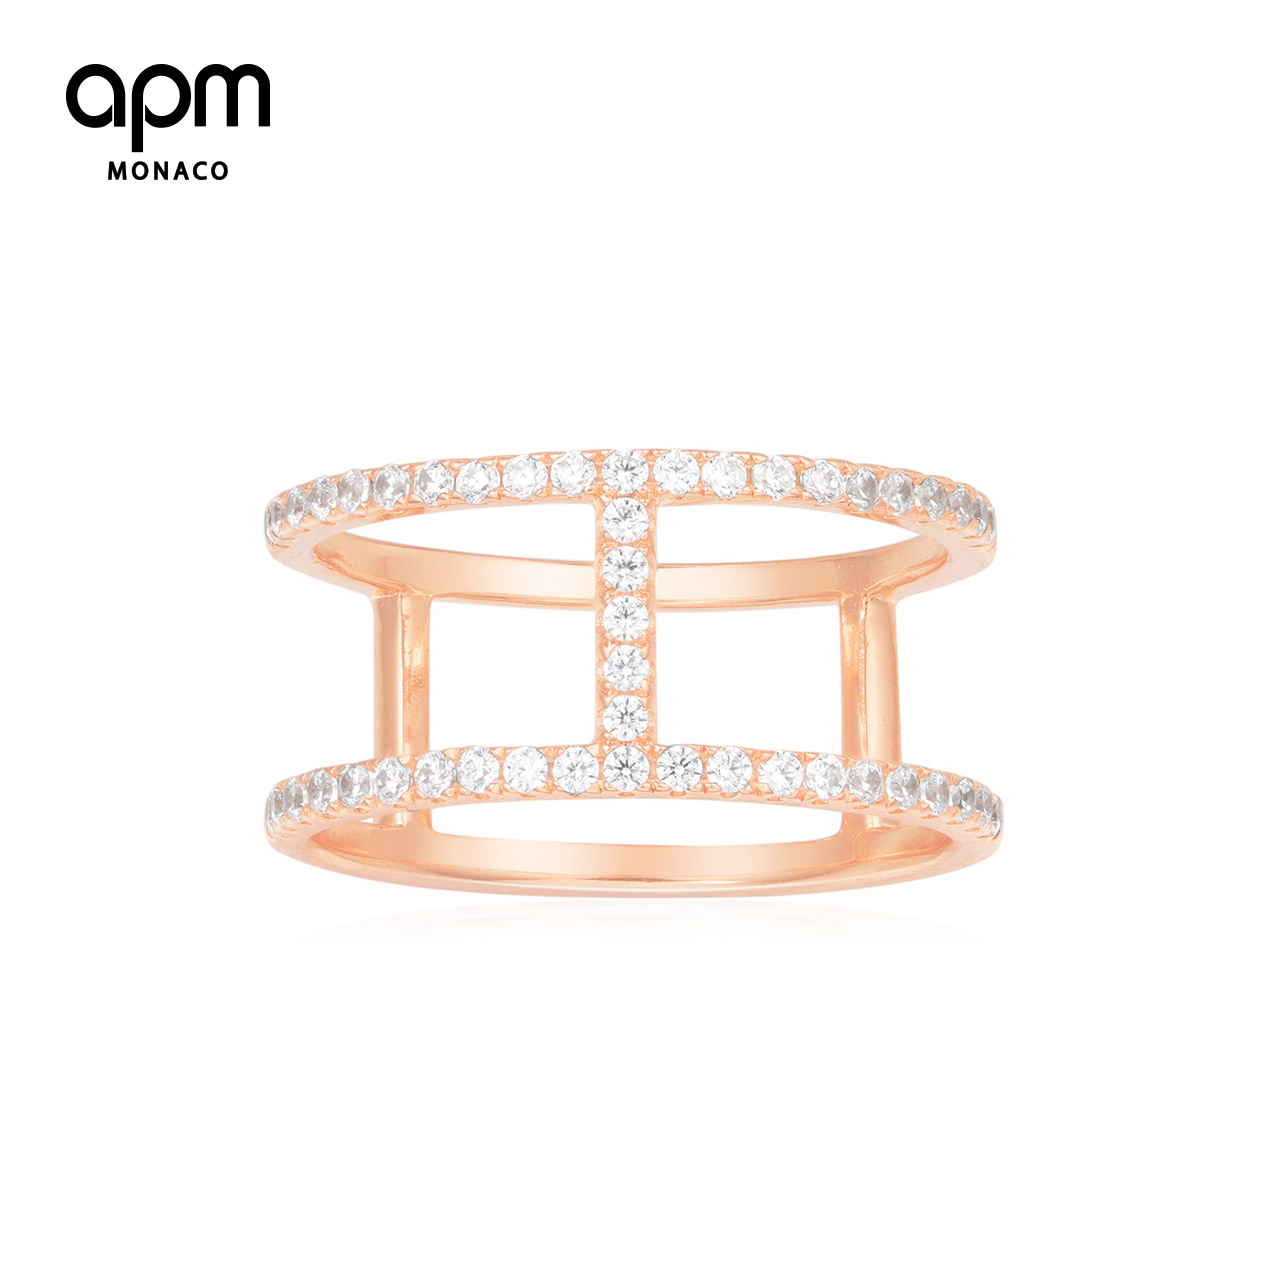 APM Monaco玫瑰粉金色戒指 情侣时尚个性指环尾戒女双圈食指戒